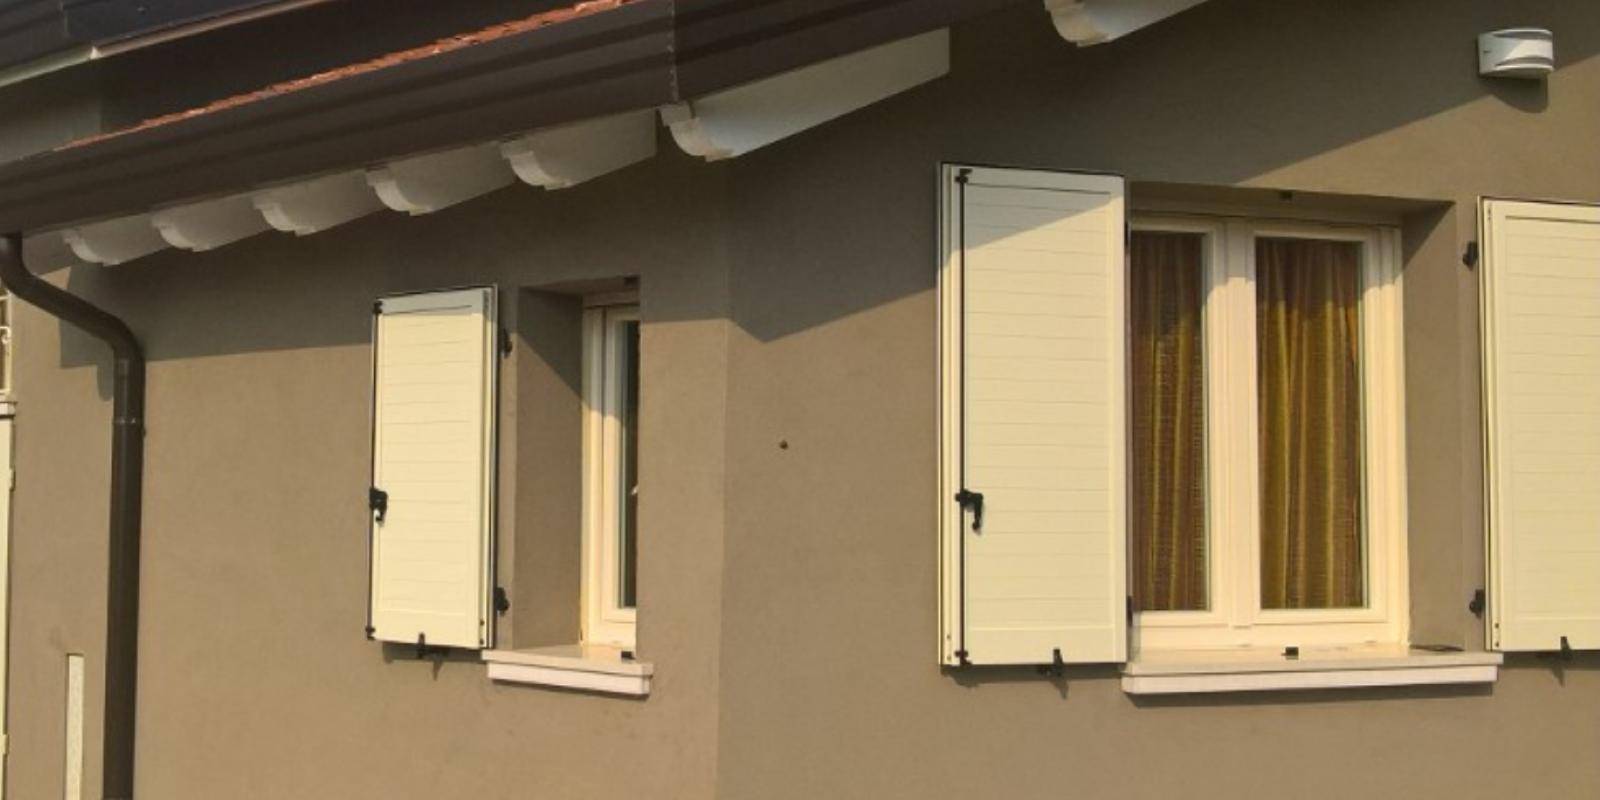 porte blindate, porte da garage, ringhiere e cancelli sicuri e di qualità